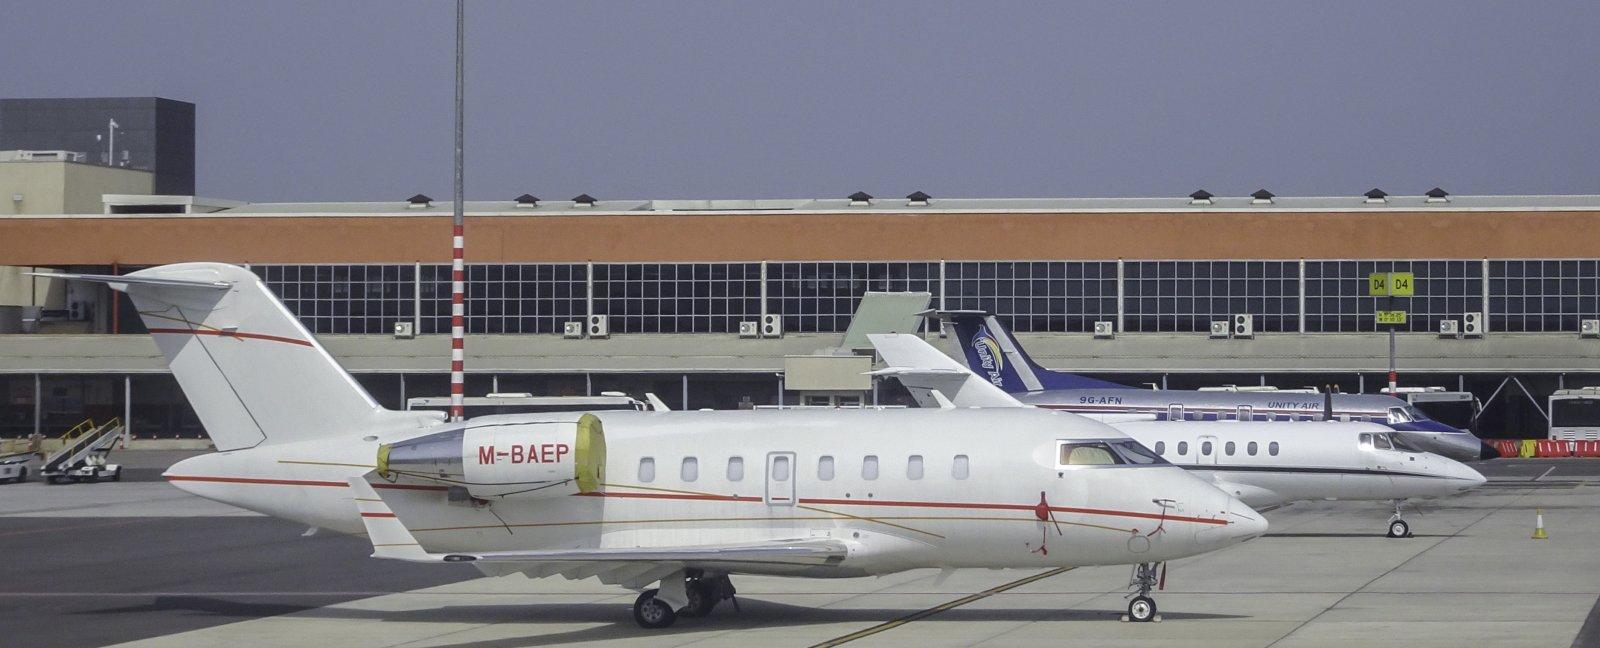 Bombardier CL-600-2B16 M-BAEP